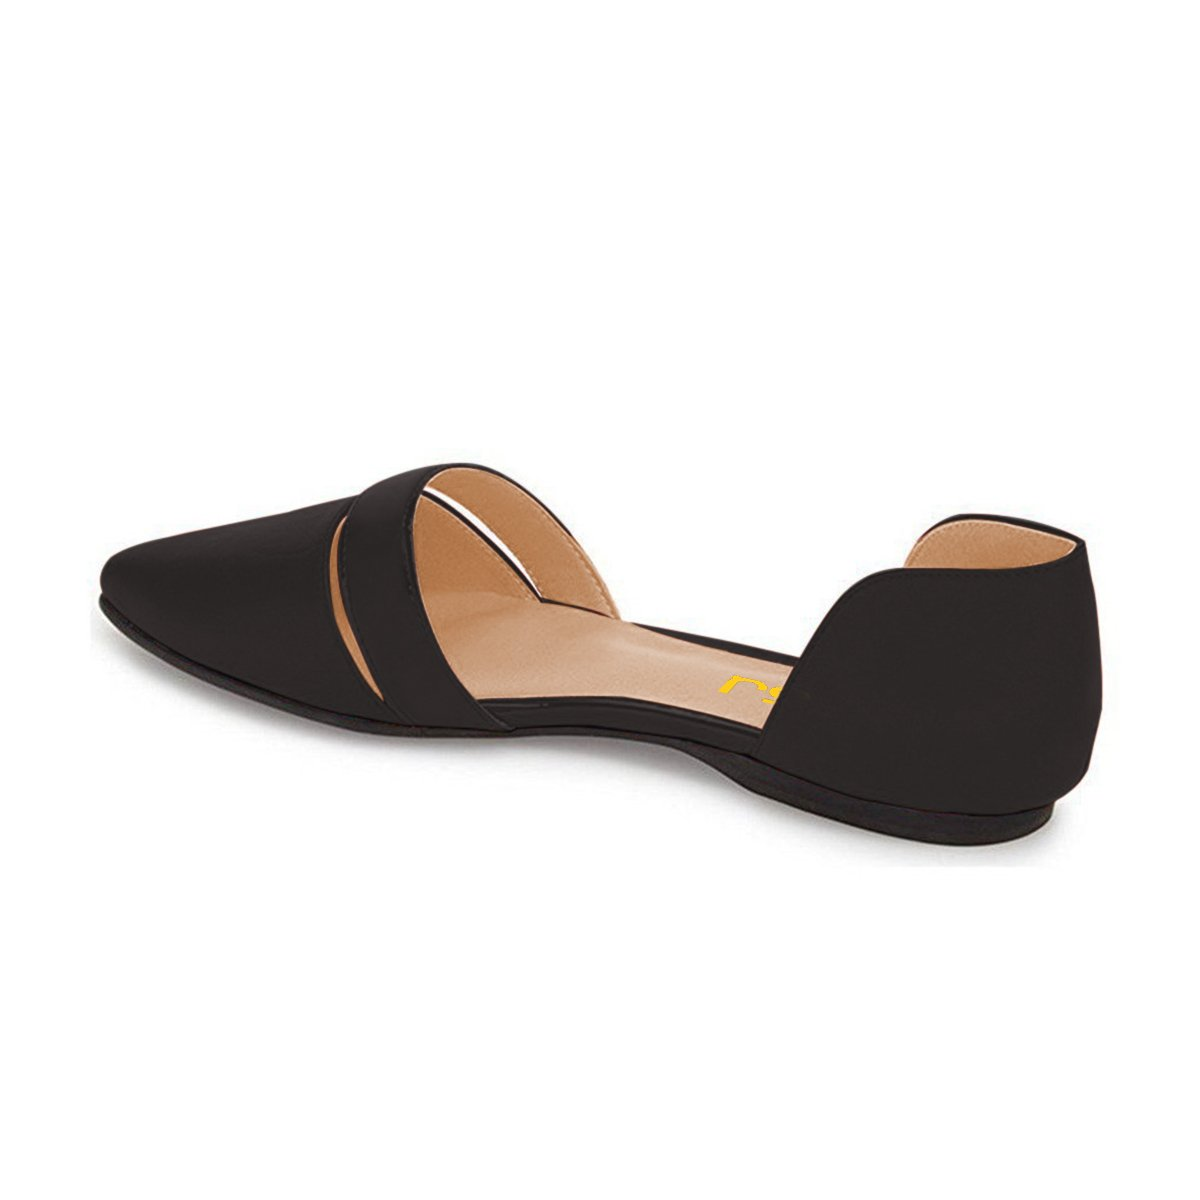 FSJ Women Cute D'Orsay Ballet Flats for Comfort Pointed Toe Size Low Heels Dress Shoes Size Toe 4-15 US B01GEGL7V4 11 B(M) US Black 62713c